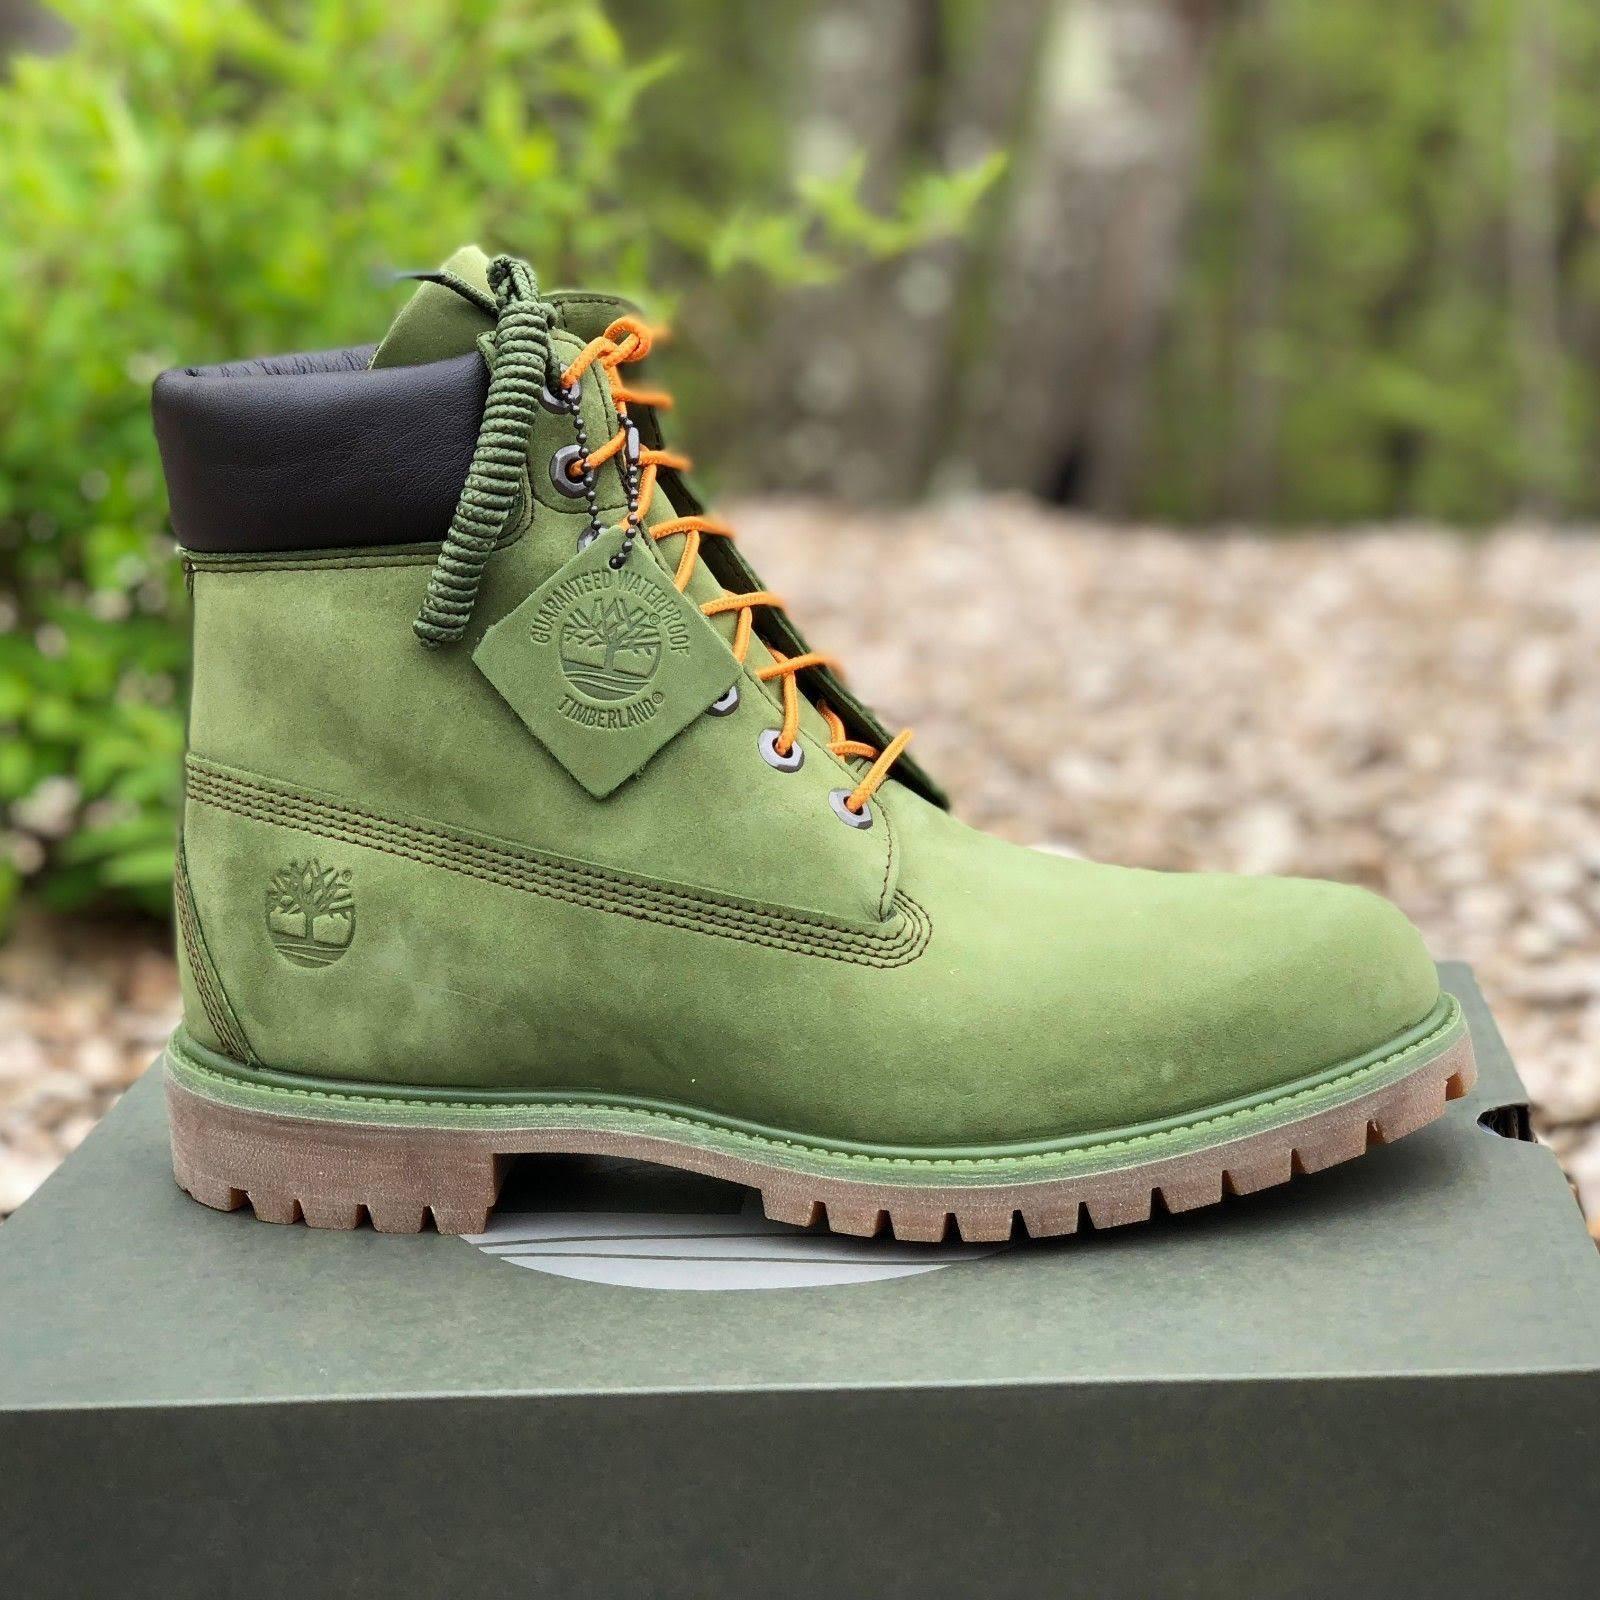 Timberland Impermeabili 6 Stivali Premium Da Uomo Men's TFclK1J3